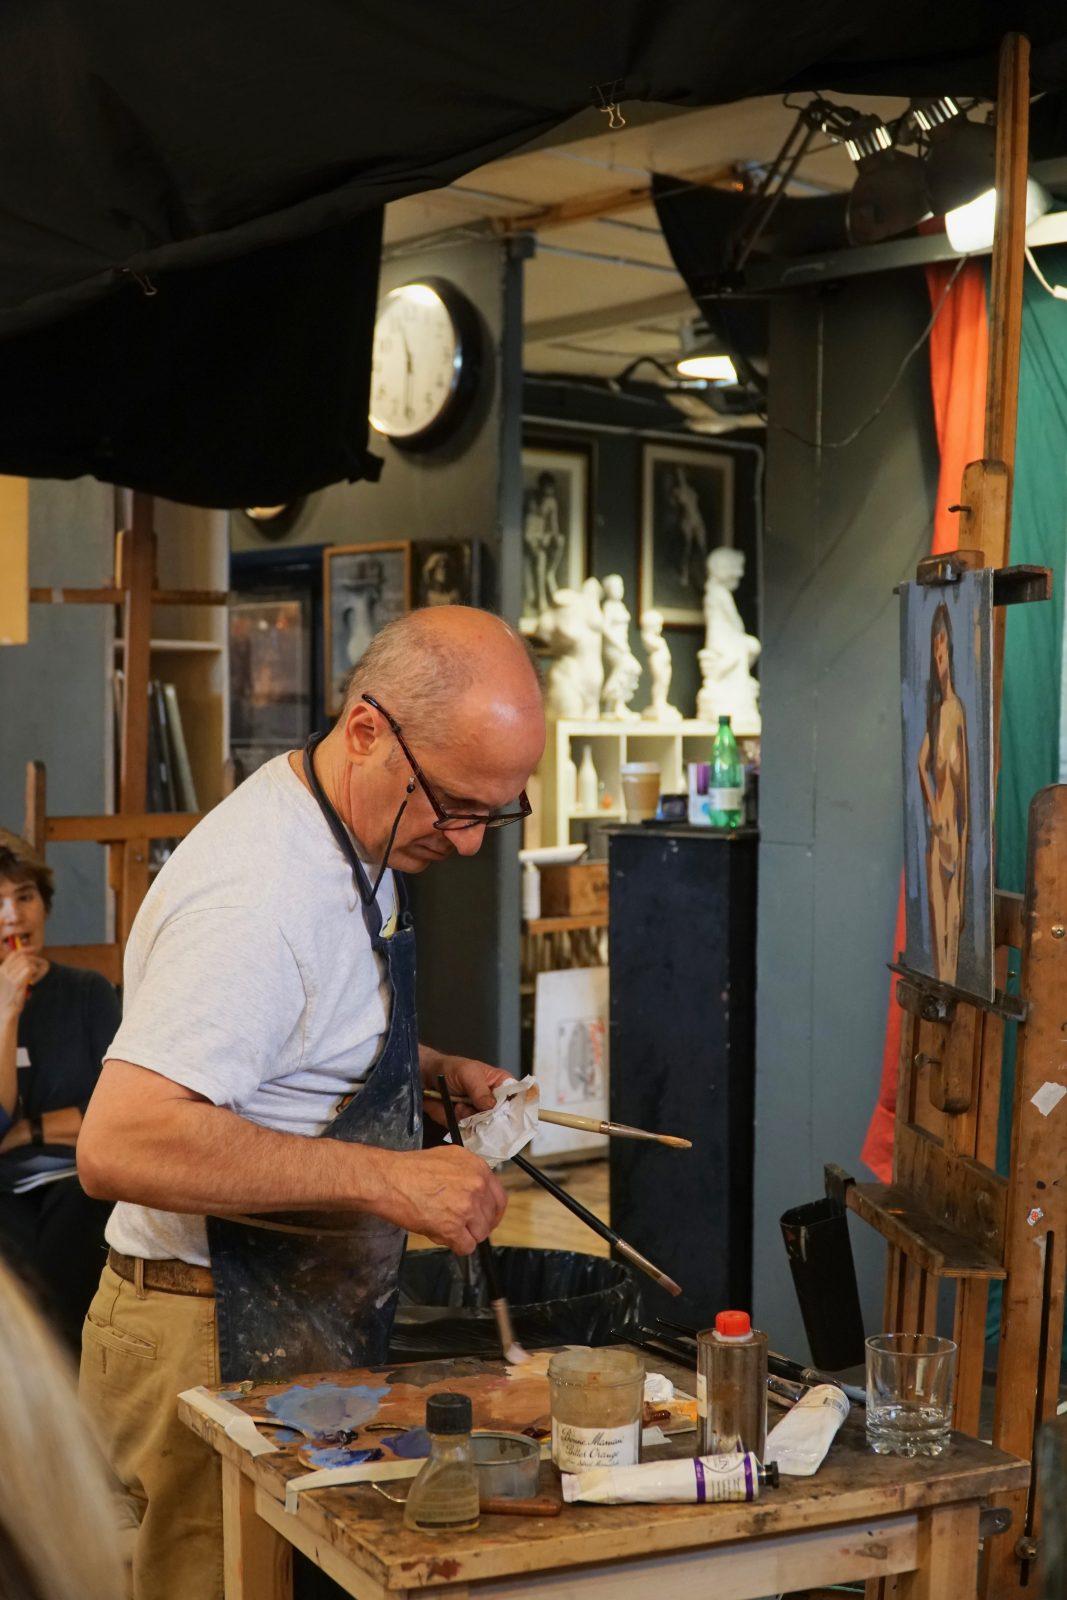 david shevlino, american artist, lonodn fine art studios, art classes, art workshops, figure painting, art class london, london fine art, visiting artists, art studios